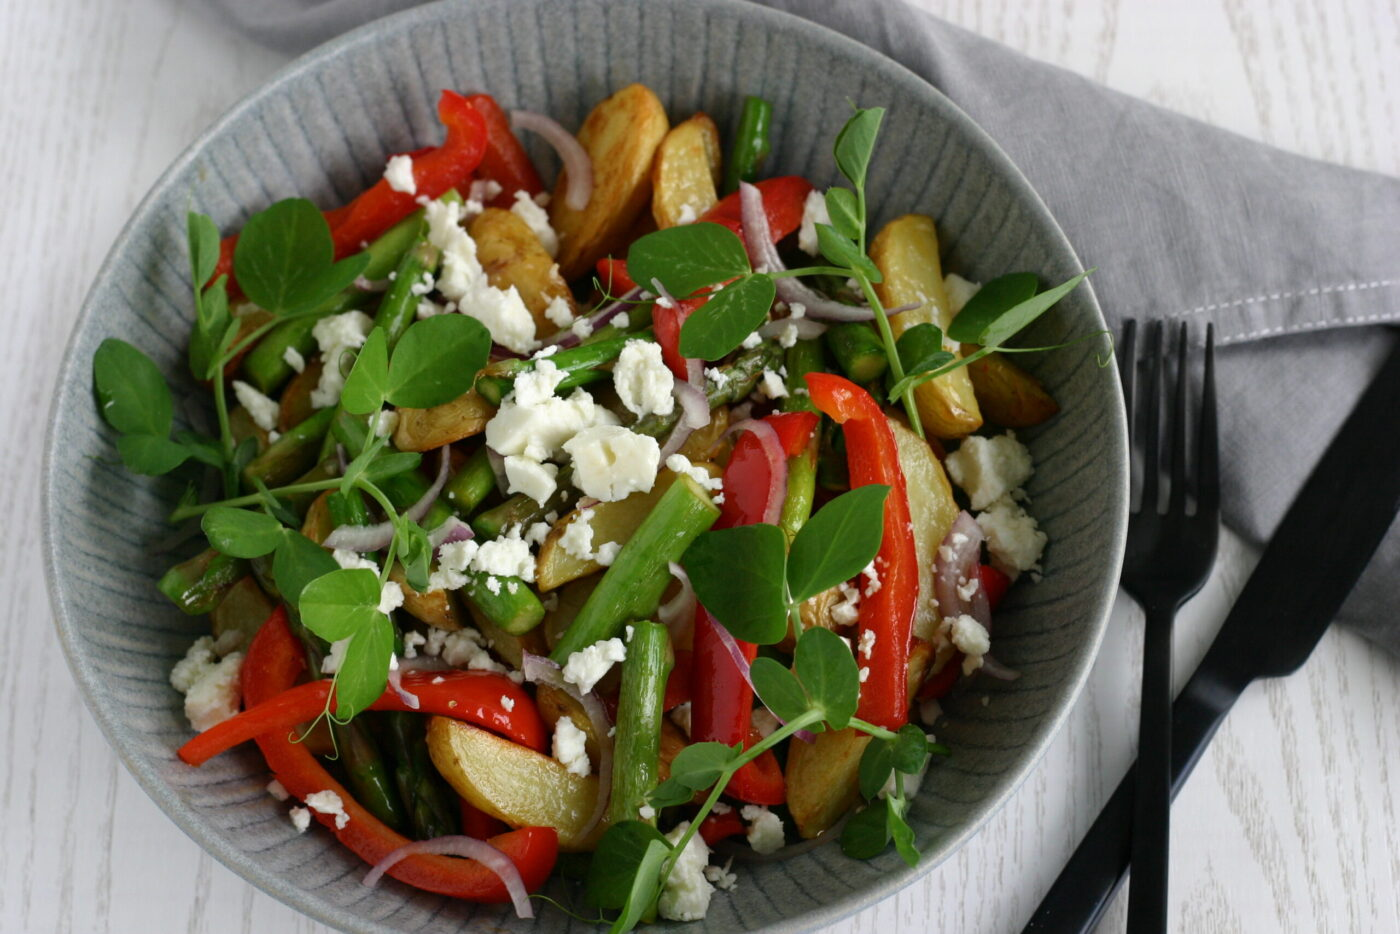 Lun kartoffelsalat med stegte grøntsager